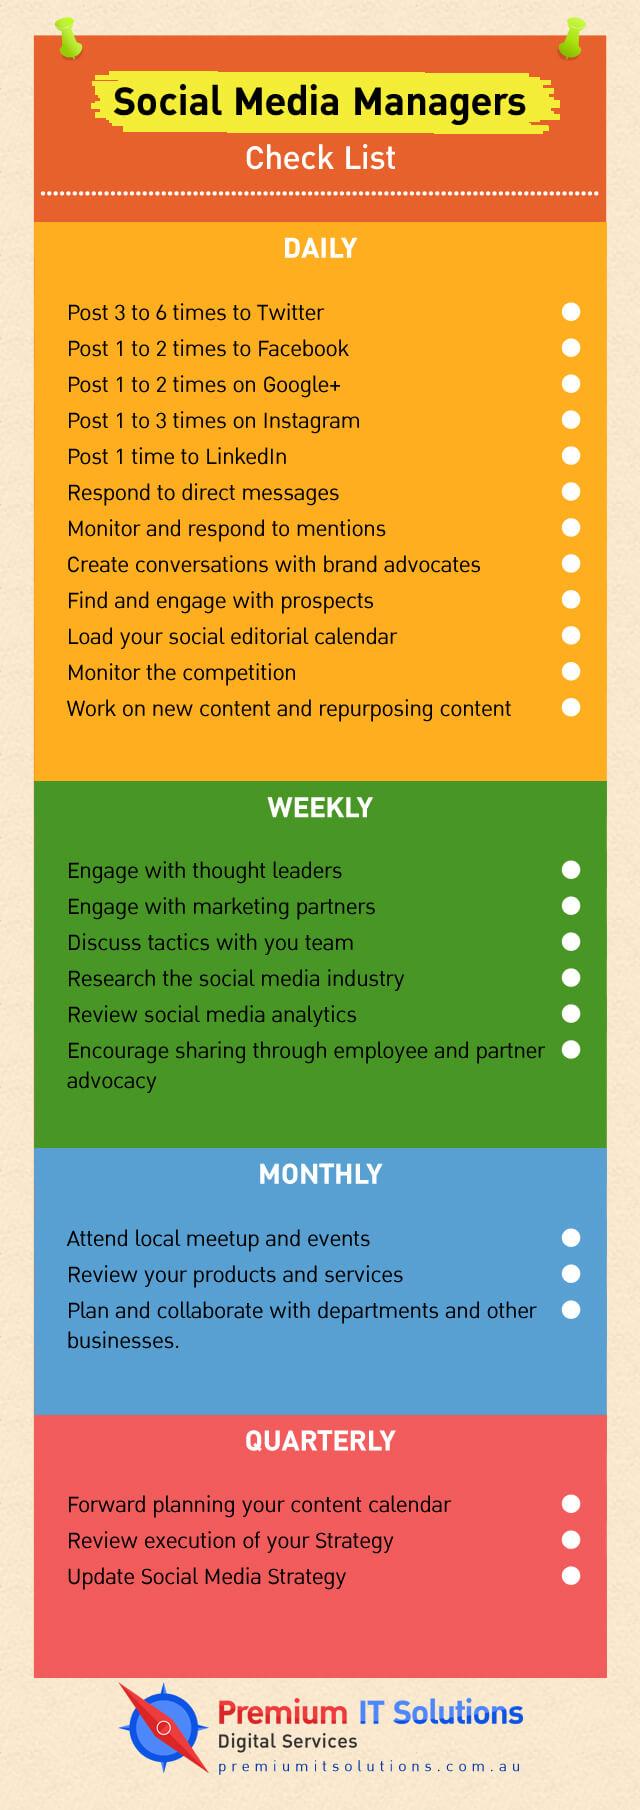 social-media-checklist-for-business